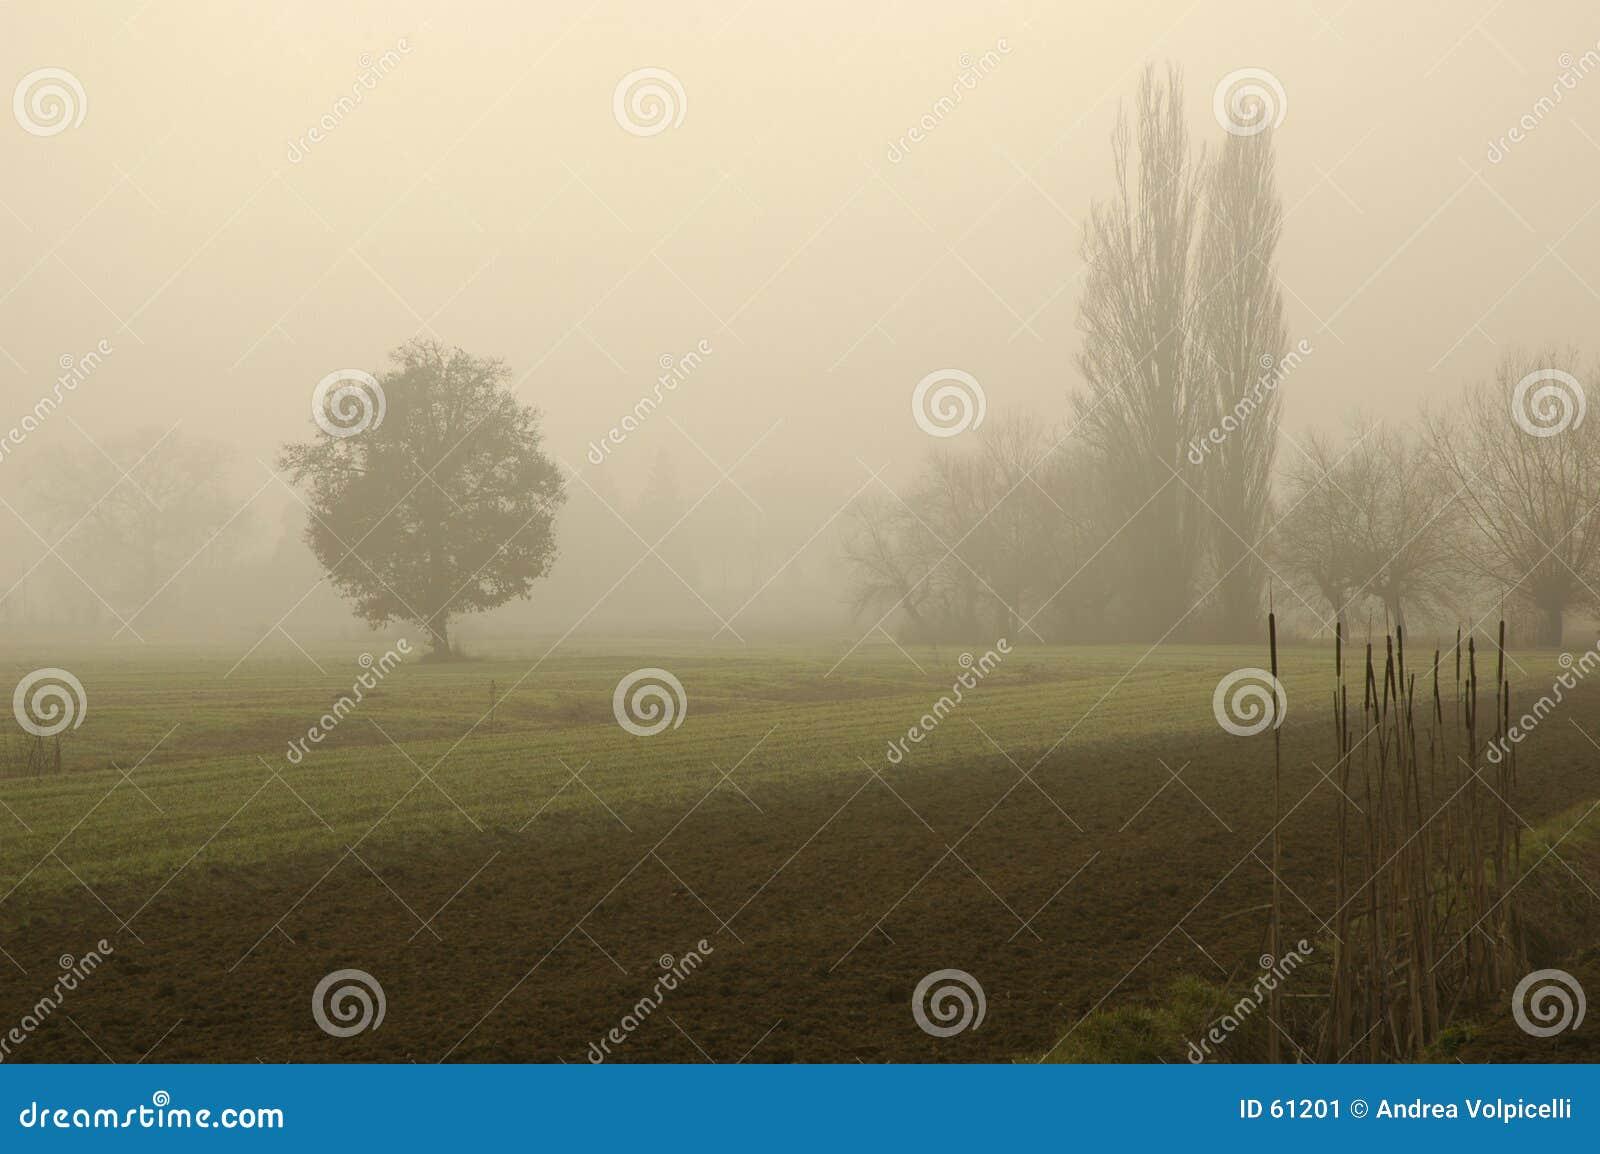 Download ομίχλη 01 στοκ εικόνα. εικόνα από ονειροπόλος, ήρεμος, ηρεμία - 61201